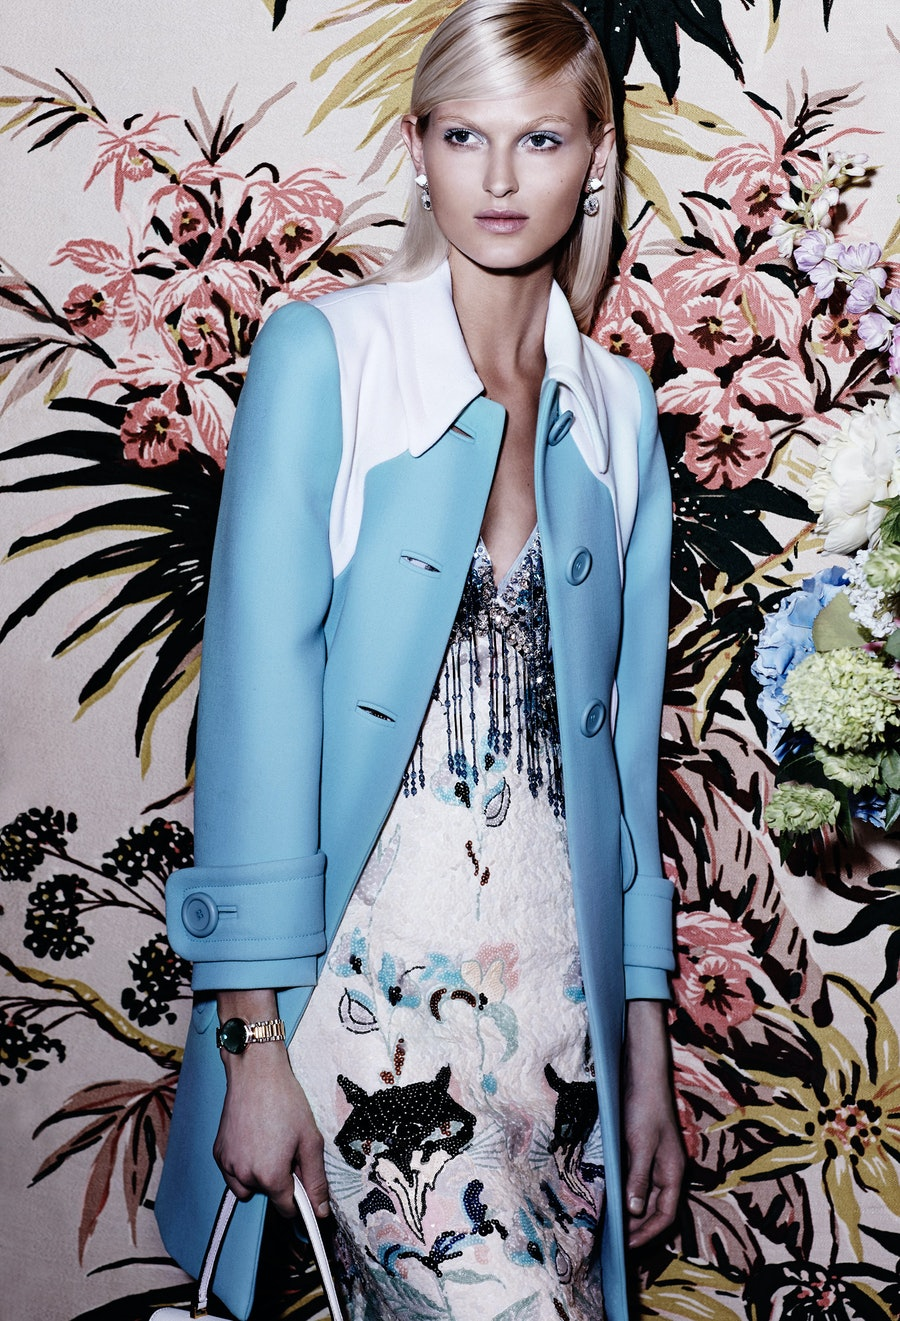 Miu Miu coat, $2,890, dress, $6,845, and bag, $1,850, [miu-miu.com](http://www.miumiu.com/en?cc=US); Givenchy by Riccardo Tisci earrings, $740, [ikram.com](http://ikram.com/). Delfina Delettrez bracelet, $1,560, [openingceremony.us](http://openingceremony.us/).